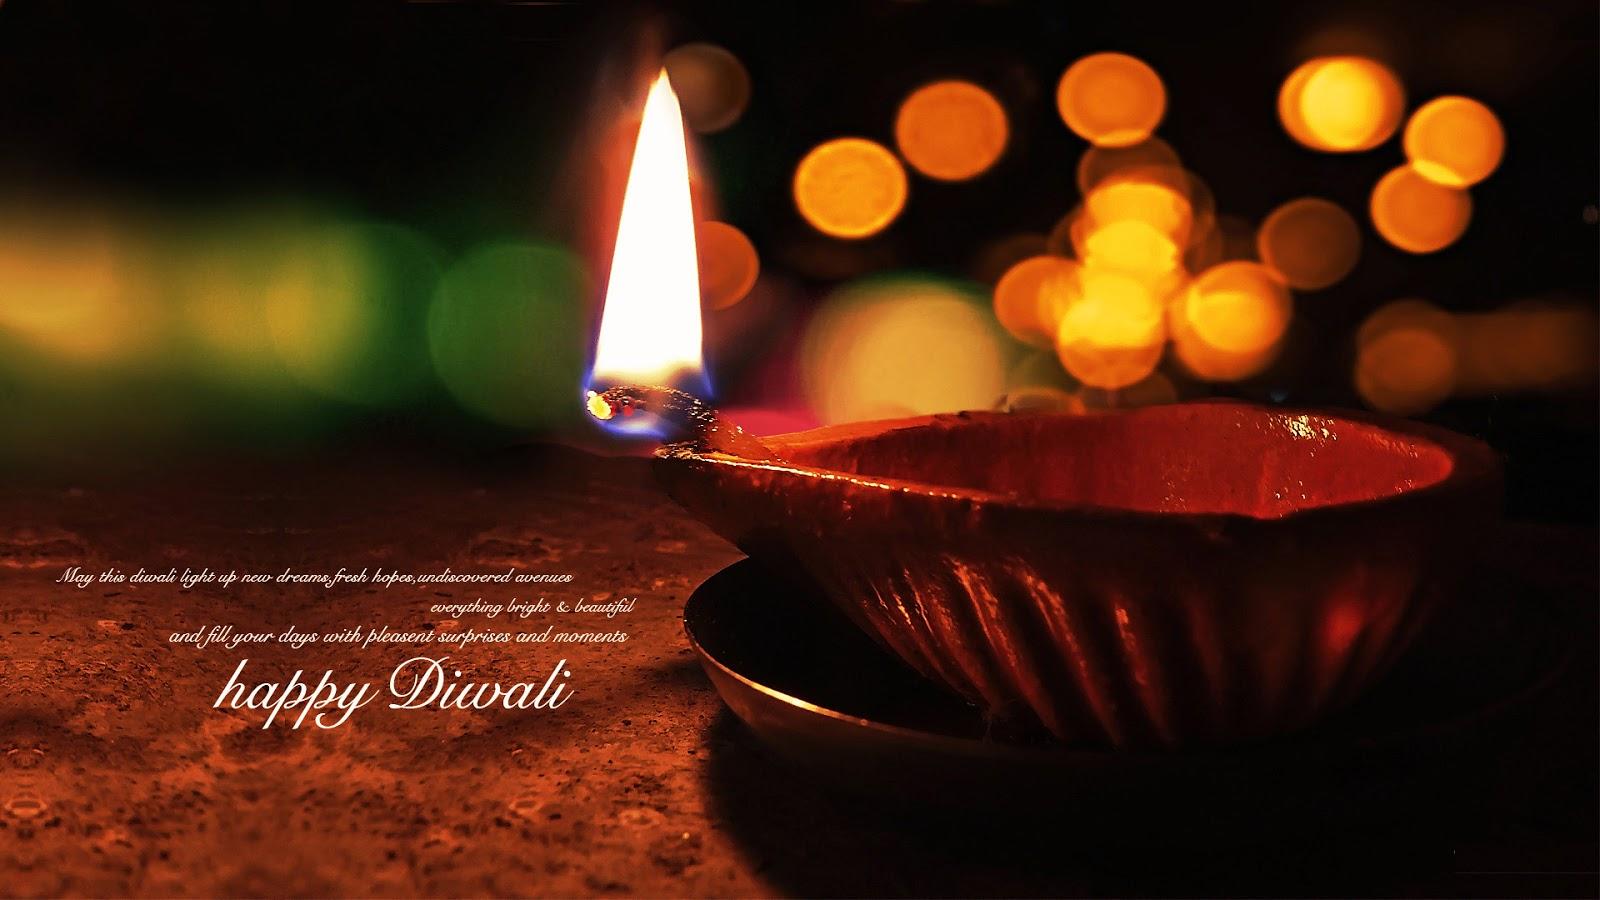 http://3.bp.blogspot.com/-Z7fmrVz9xm0/UJT5y5uhd-I/AAAAAAAAJHE/wt7teUg1dlI/s1600/diwali-wishes-walllpaers_diwali-greetings-banners-19.jpg